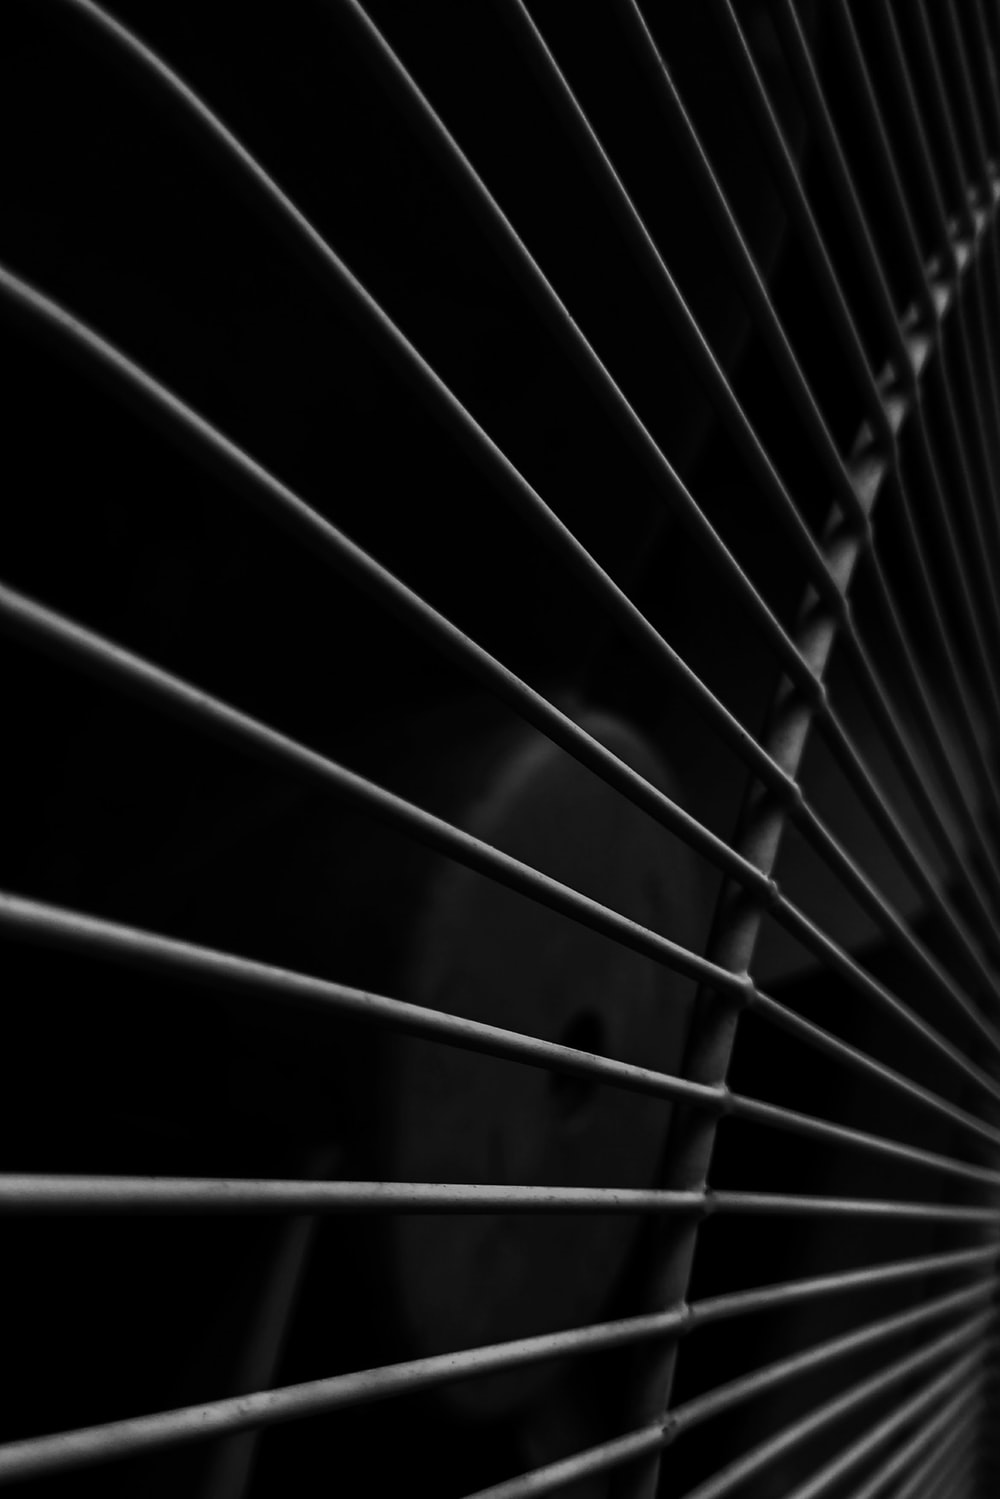 closeup photography of electric fan